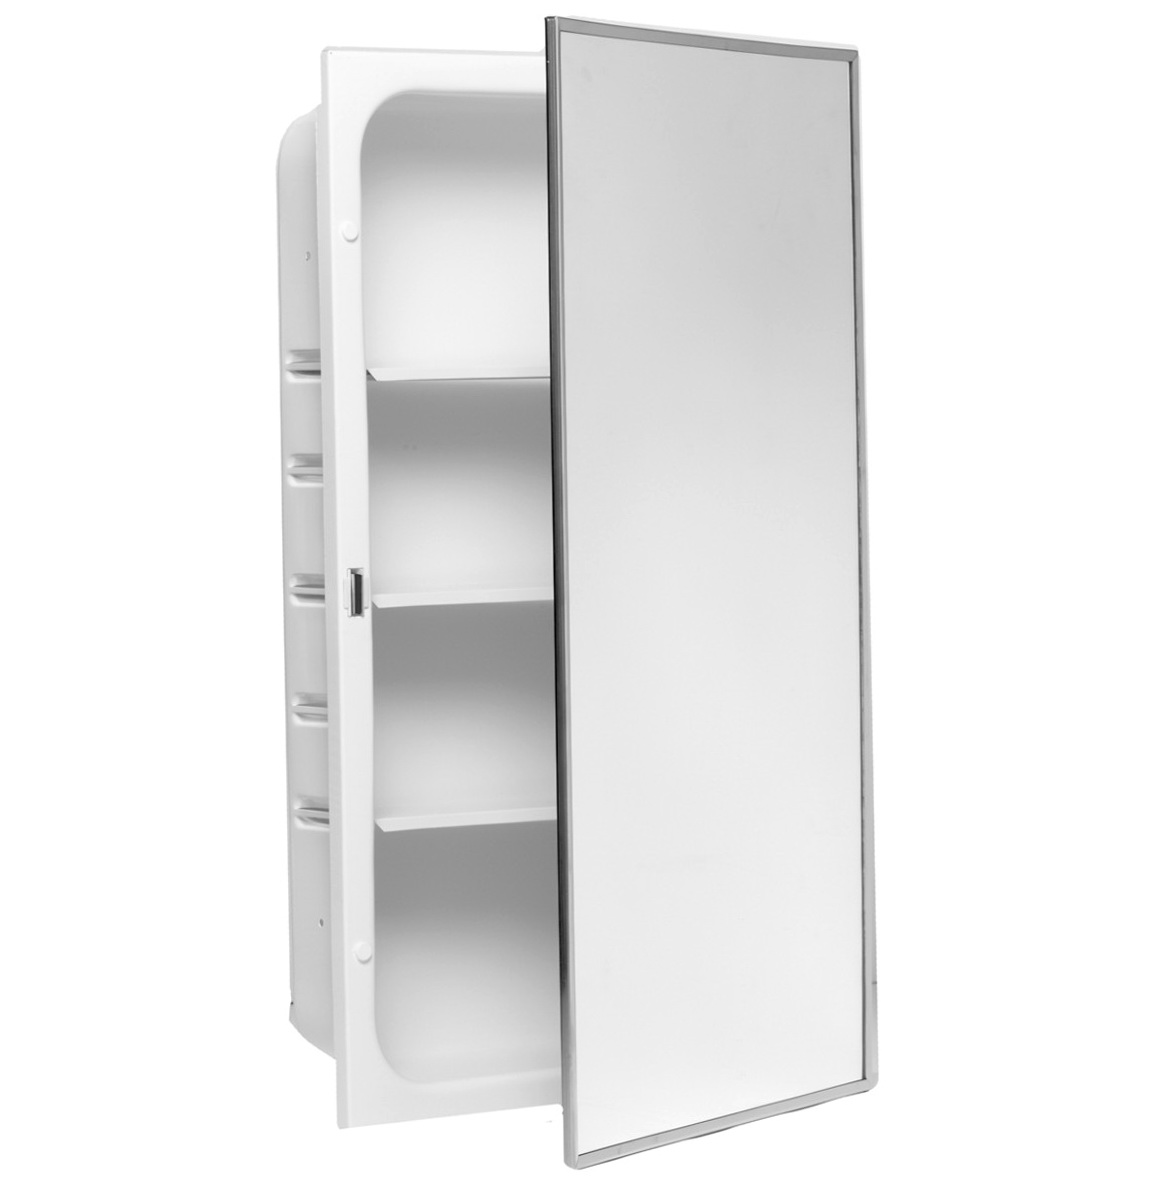 Zenith Medicine Cabinet Replacement Shelves